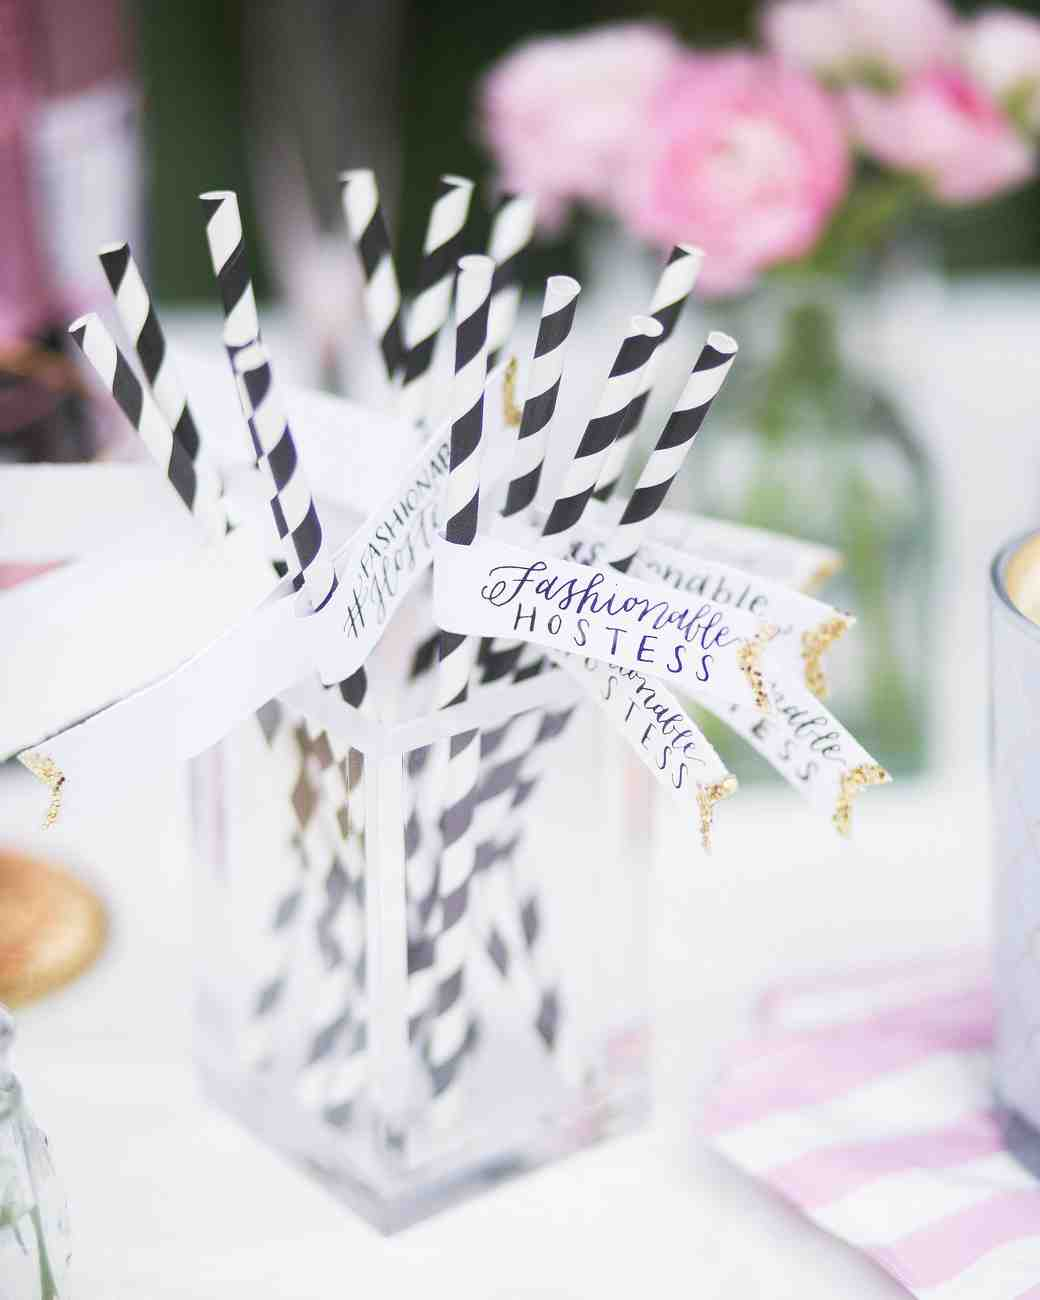 fashionable-hostess-bridal-shower-custom-straws-0716.jpg